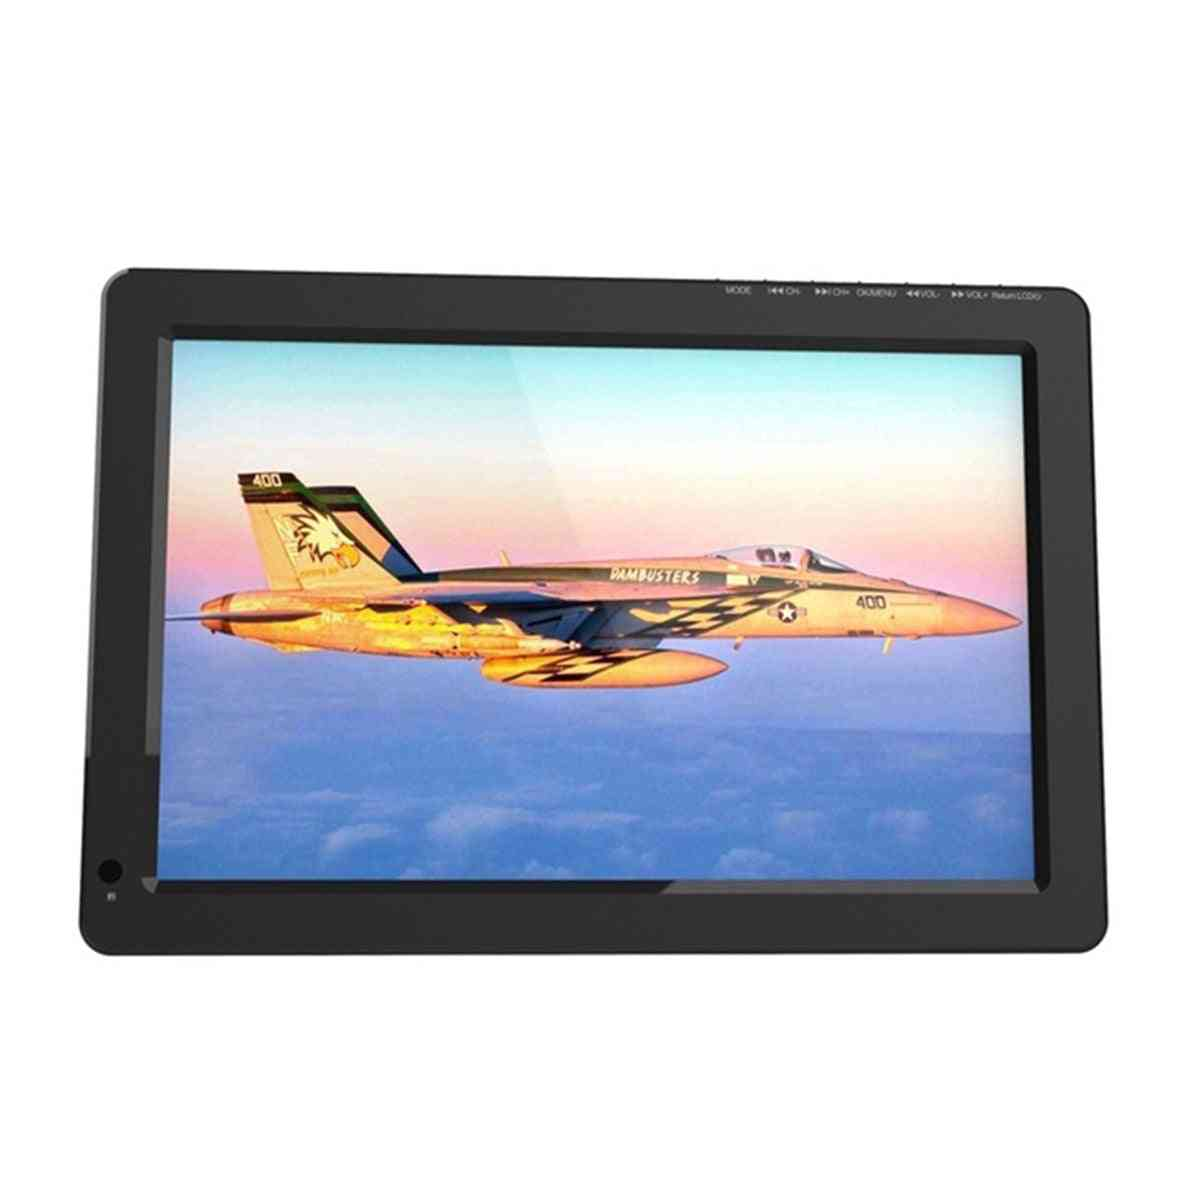 12v 18w 12.1 Inch Portable Digital Mini Tv Dvb-t / Dvb-t2 Tft Led 1080p Hd Car Tv Support Tf Card Usb